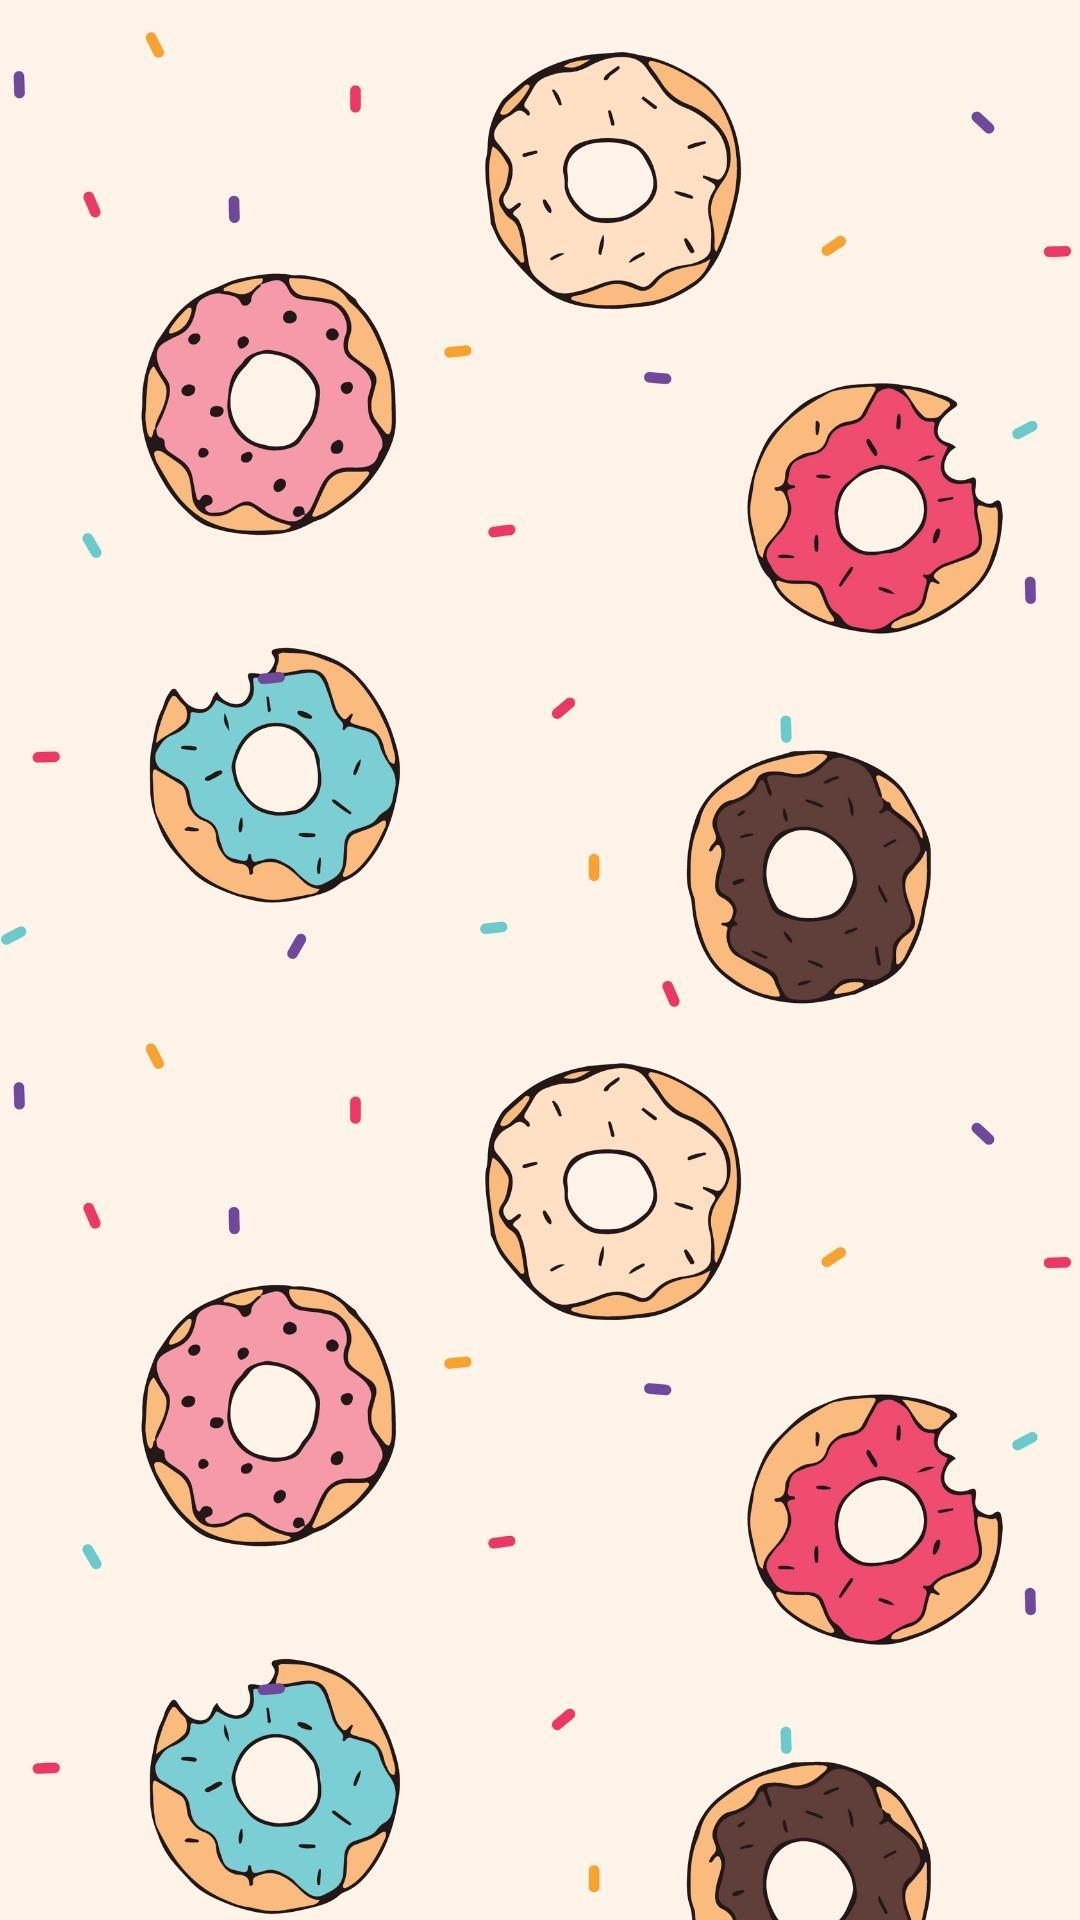 Super Cute Wallpapers - Top Free Super